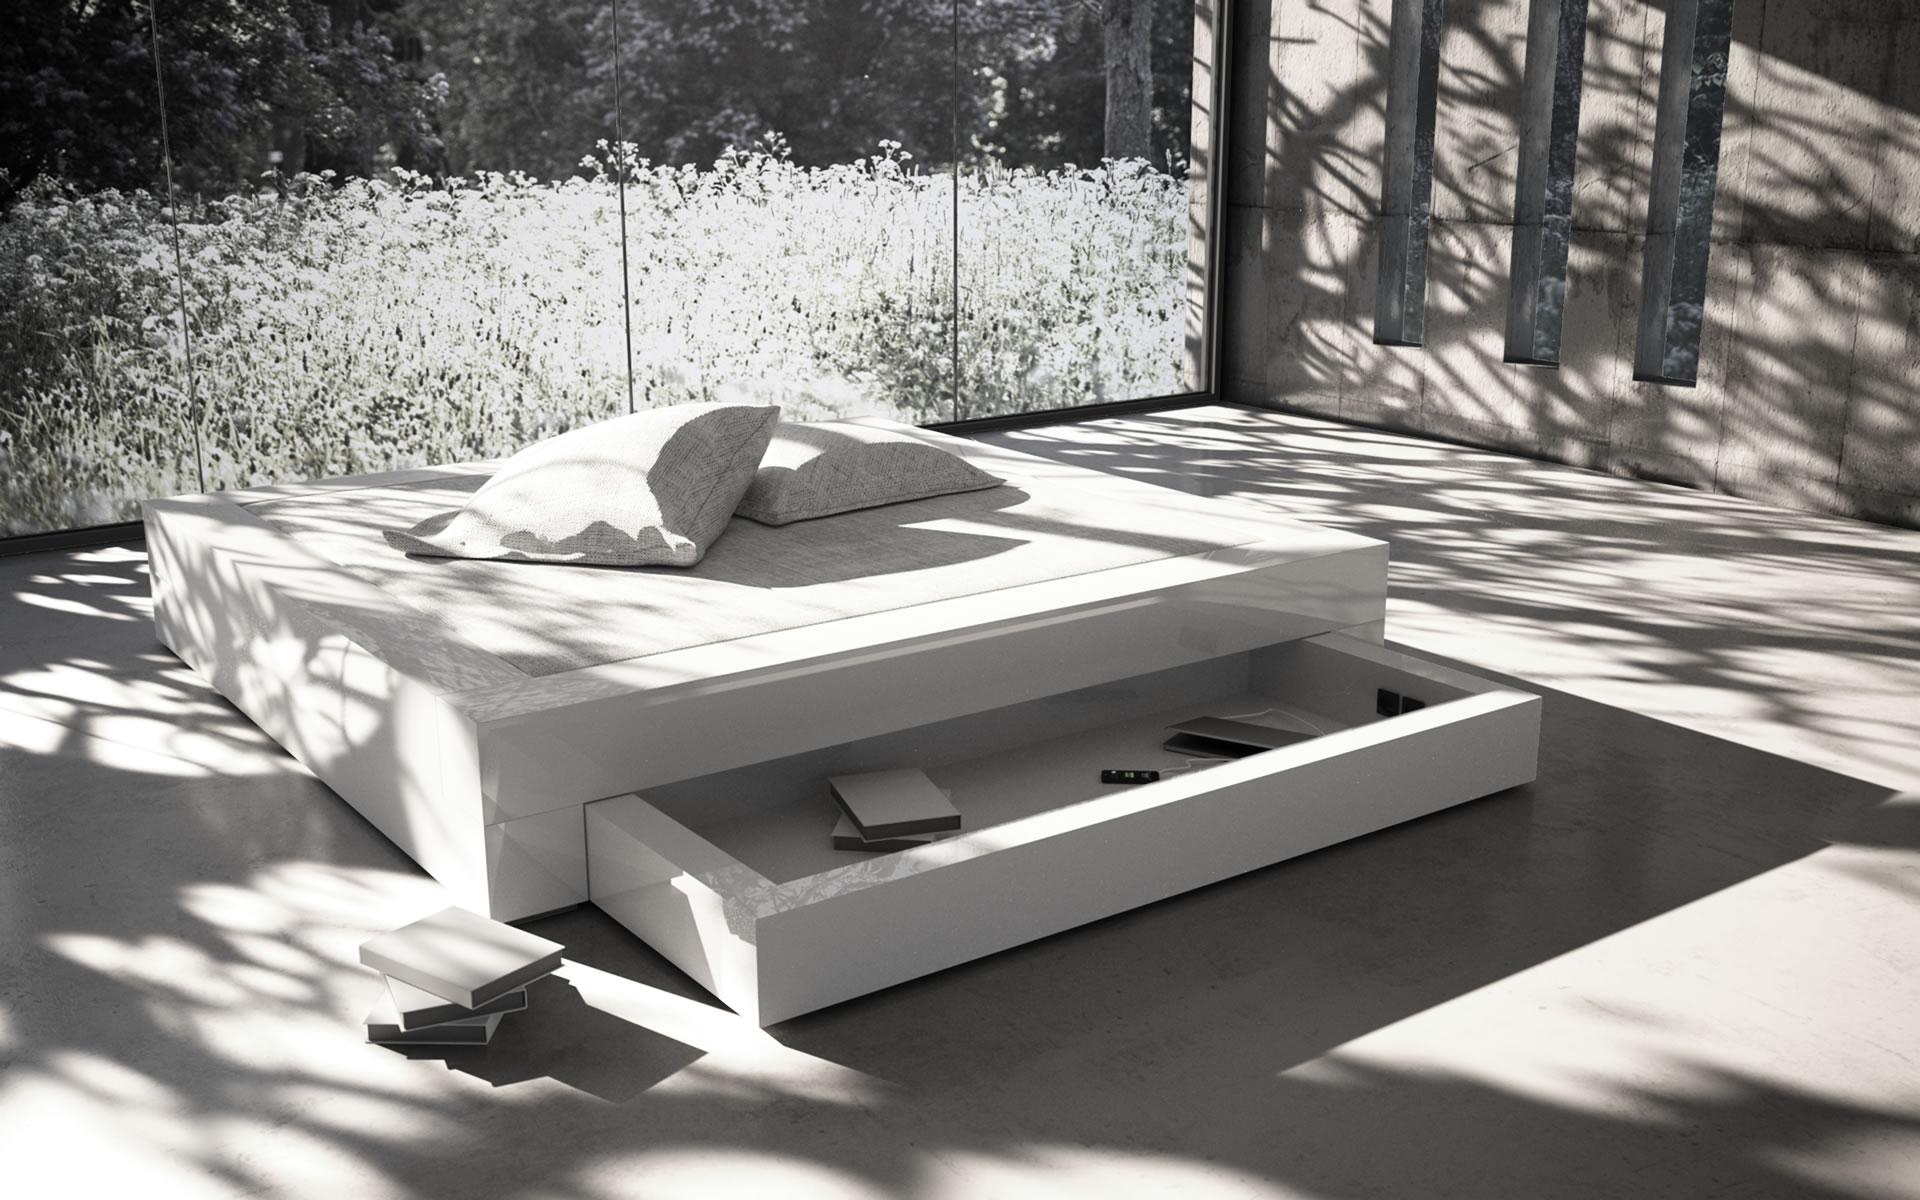 Bett somnium mit bettkasten preis 140x200 design bett for Designer bett